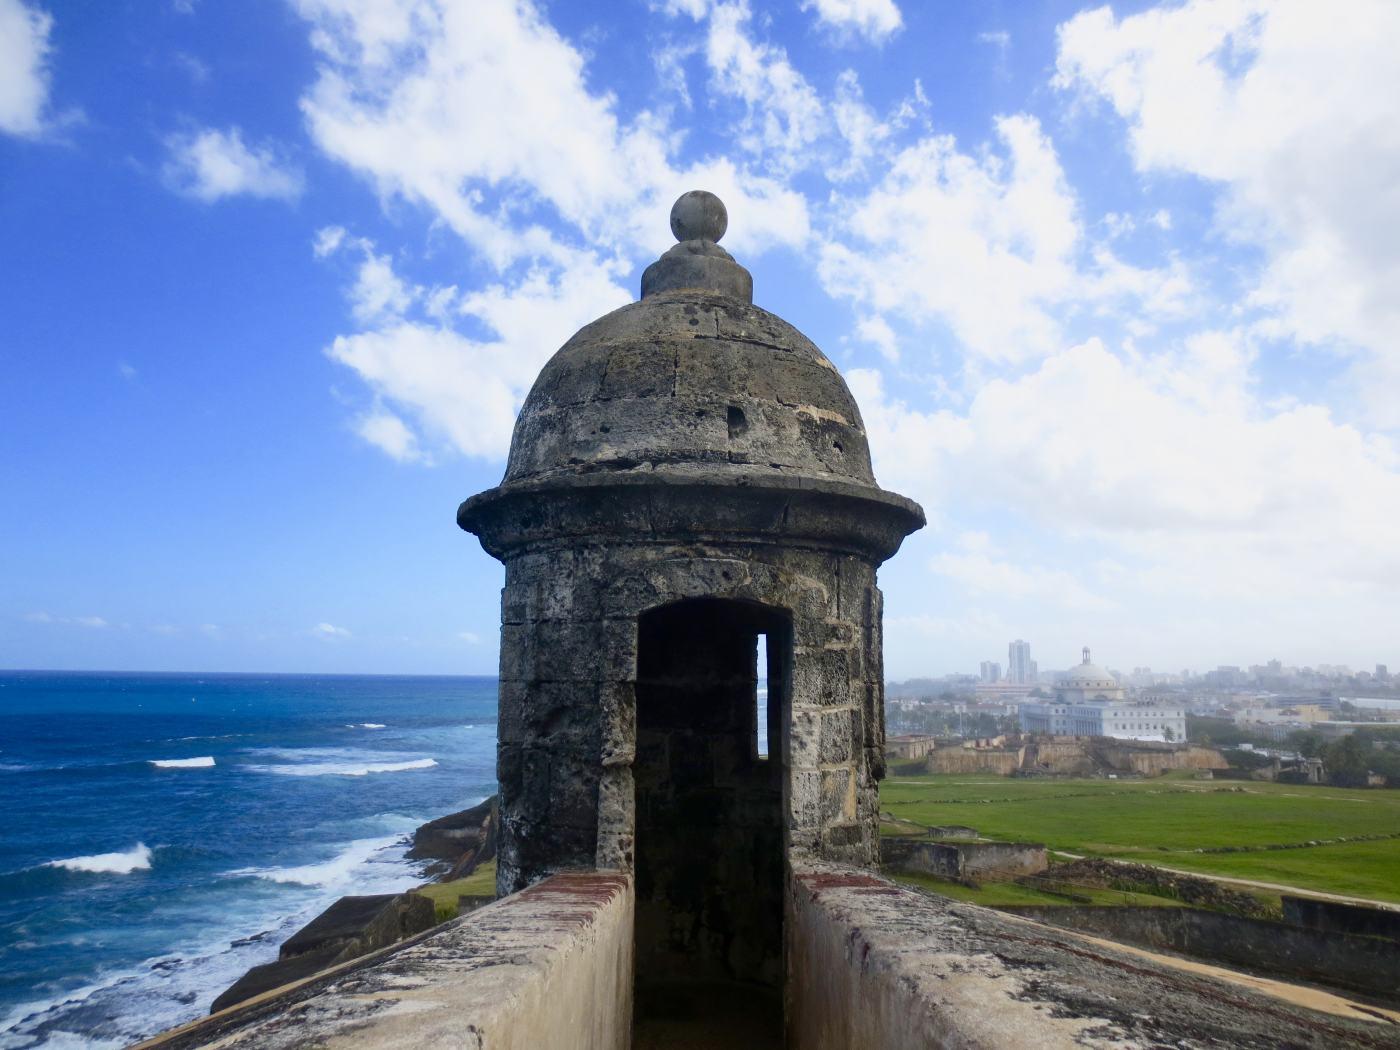 El Morro Old San Juan